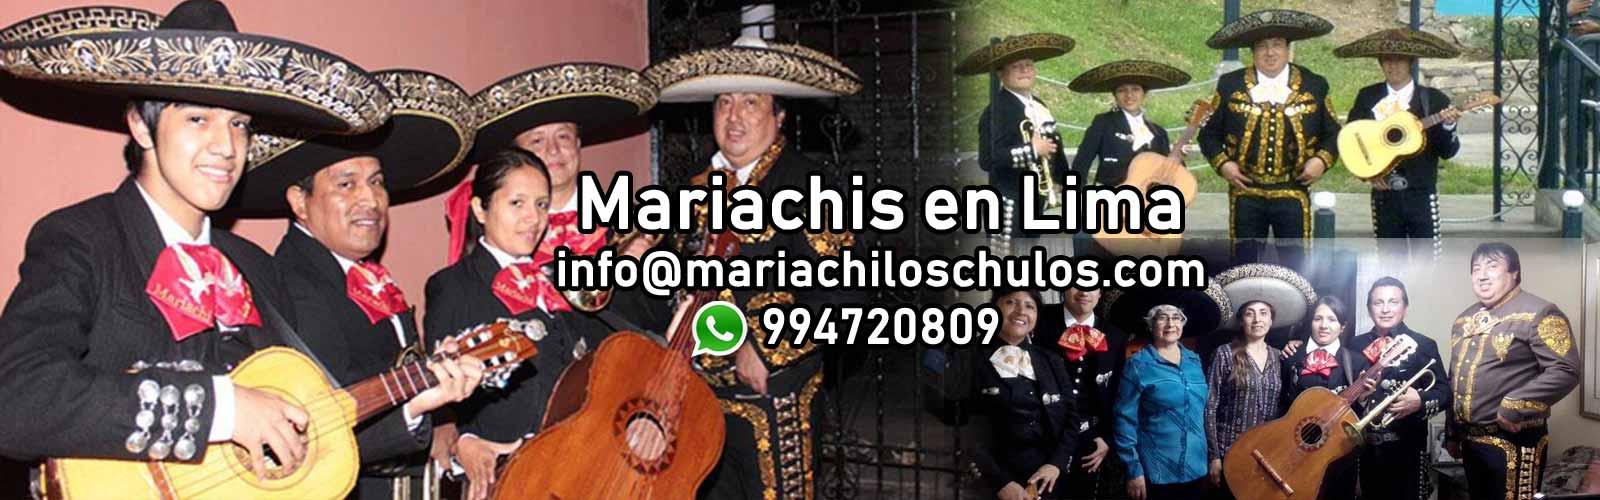 Mariachis es Lima